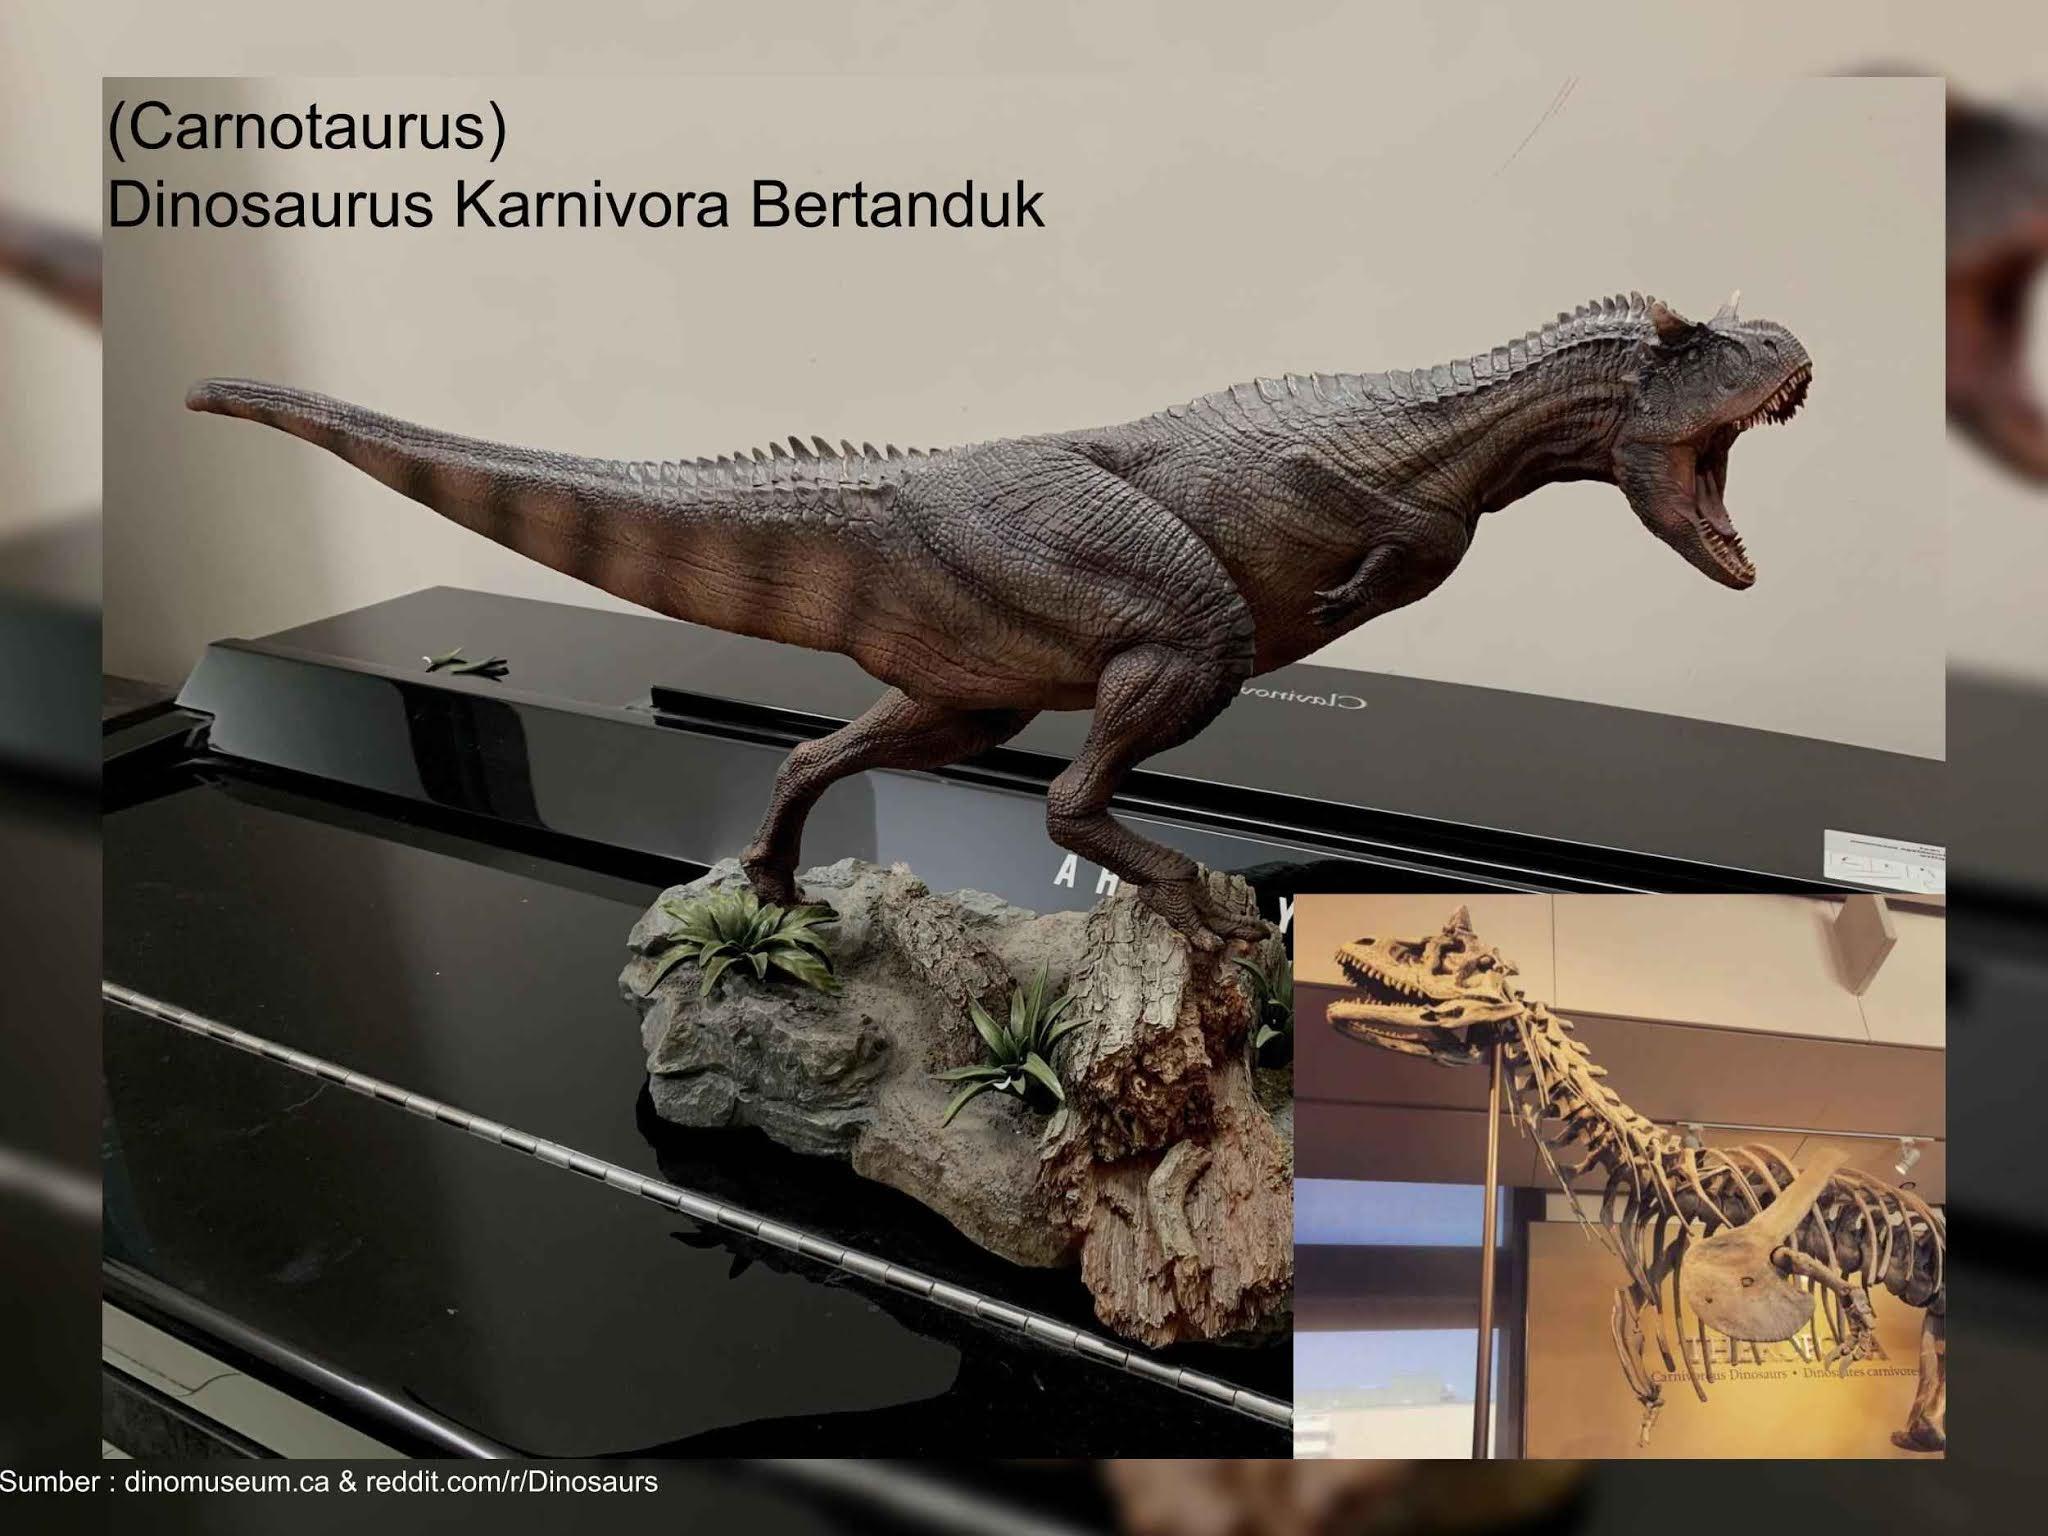 carnotaurus, dinosaurus karnivora bertanduk